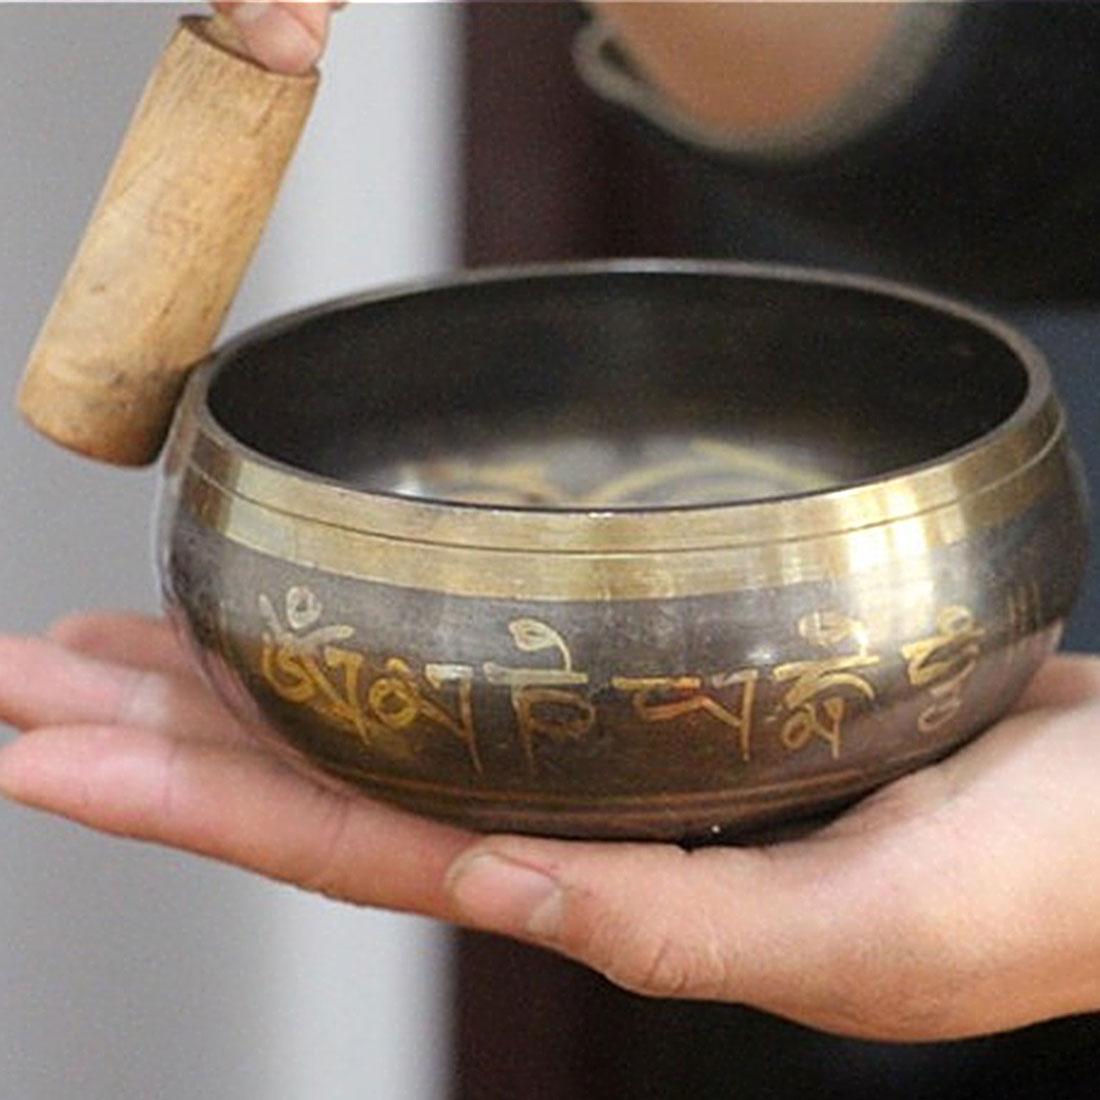 Tibetan Singing Bowl Decorative Xizang Sacrifice Sacred Dharma Monks Lama Decorative-wall-dishes Home DecorationTibetan Singing Bowl Decorative Xizang Sacrifice Sacred Dharma Monks Lama Decorative-wall-dishes Home Decoration